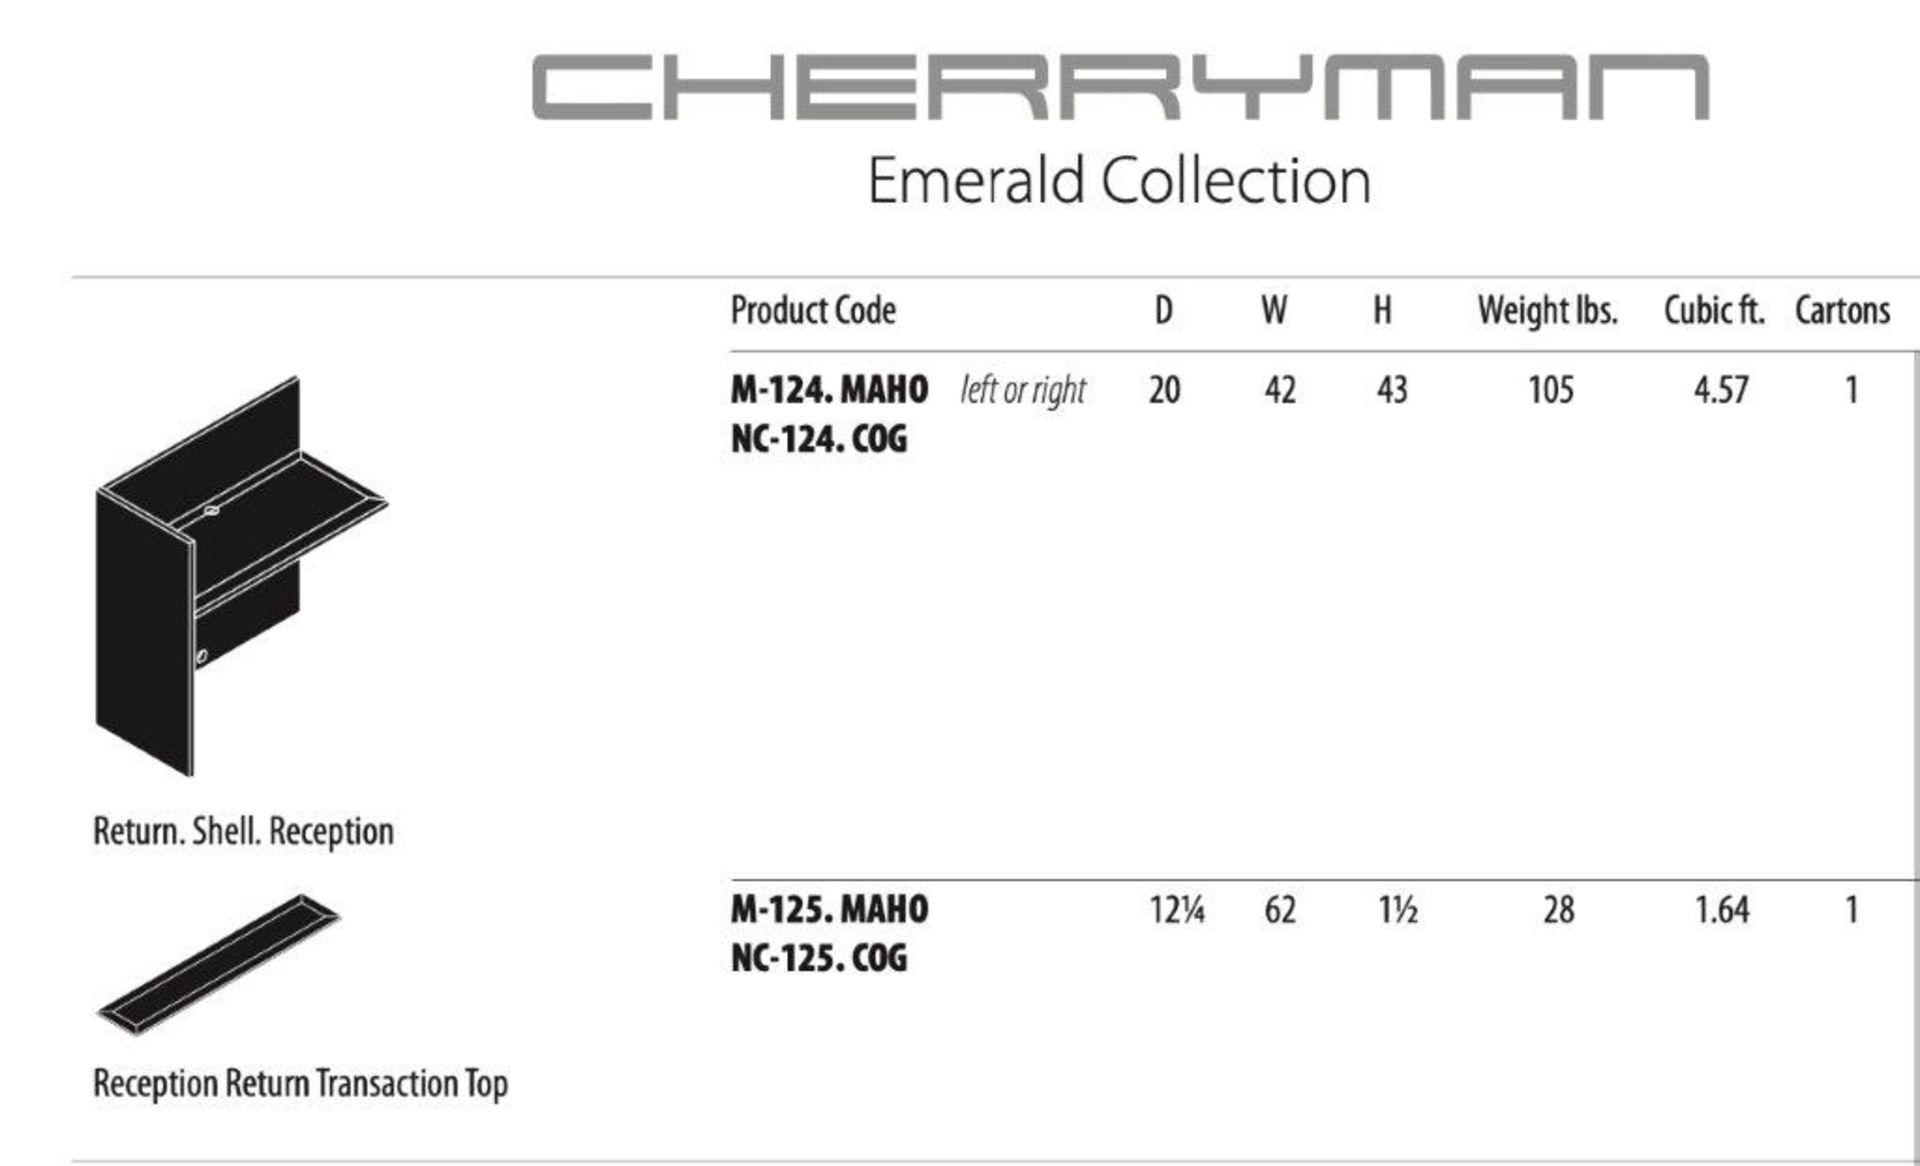 Cherryman Emerald Collection Mahogany Reception Trans Return Top (M125) (Original List price - Image 2 of 2